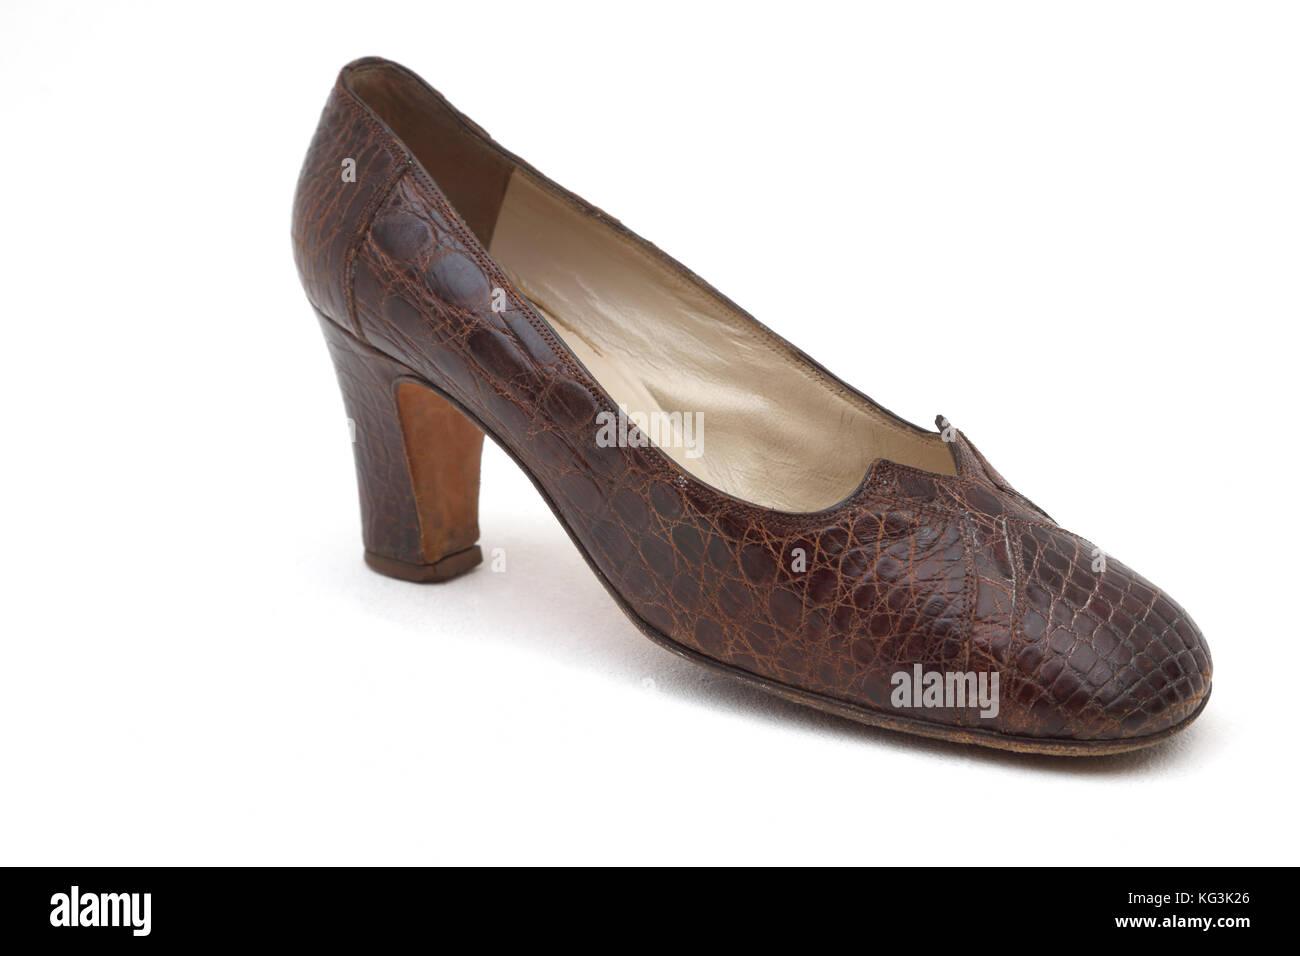 b5b48141f30 Heel Shoe Stock Photos   Heel Shoe Stock Images - Alamy